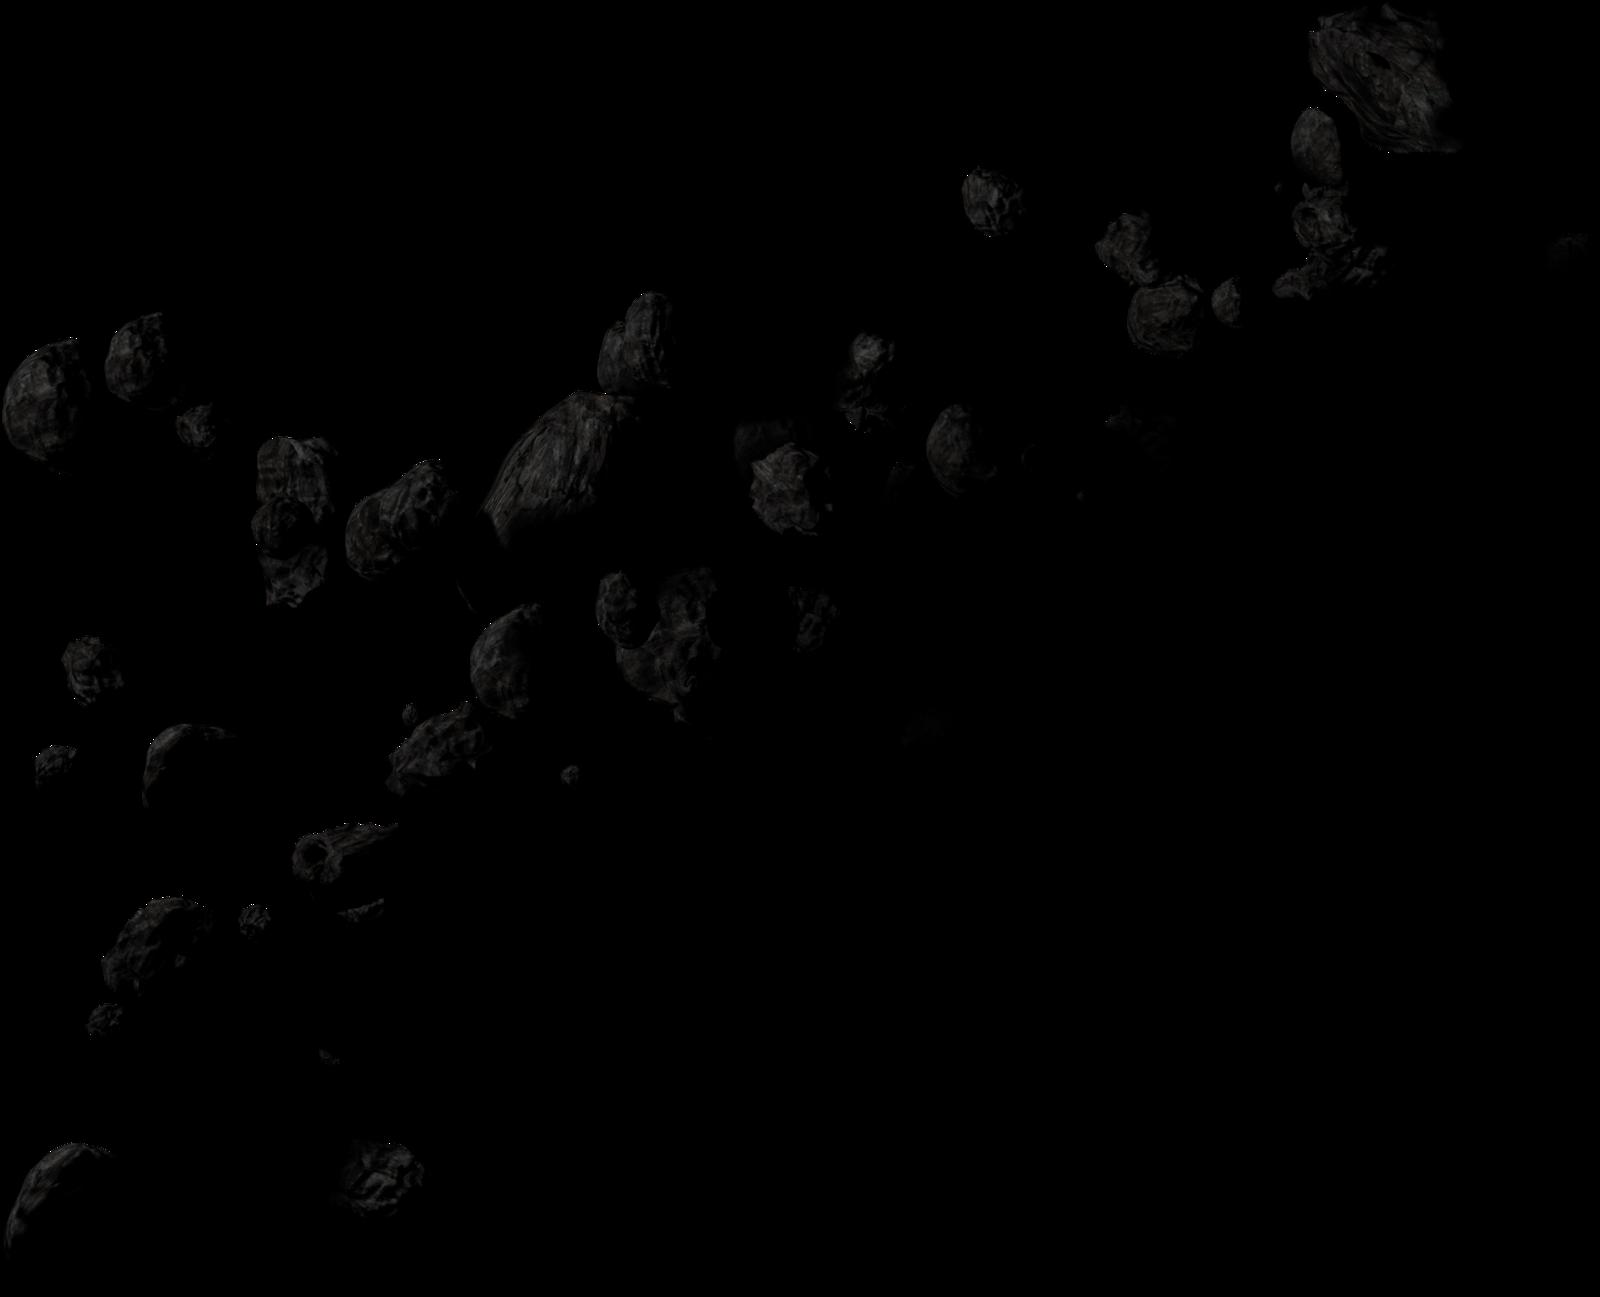 Belt clip art transparent. Asteroid clipart white background